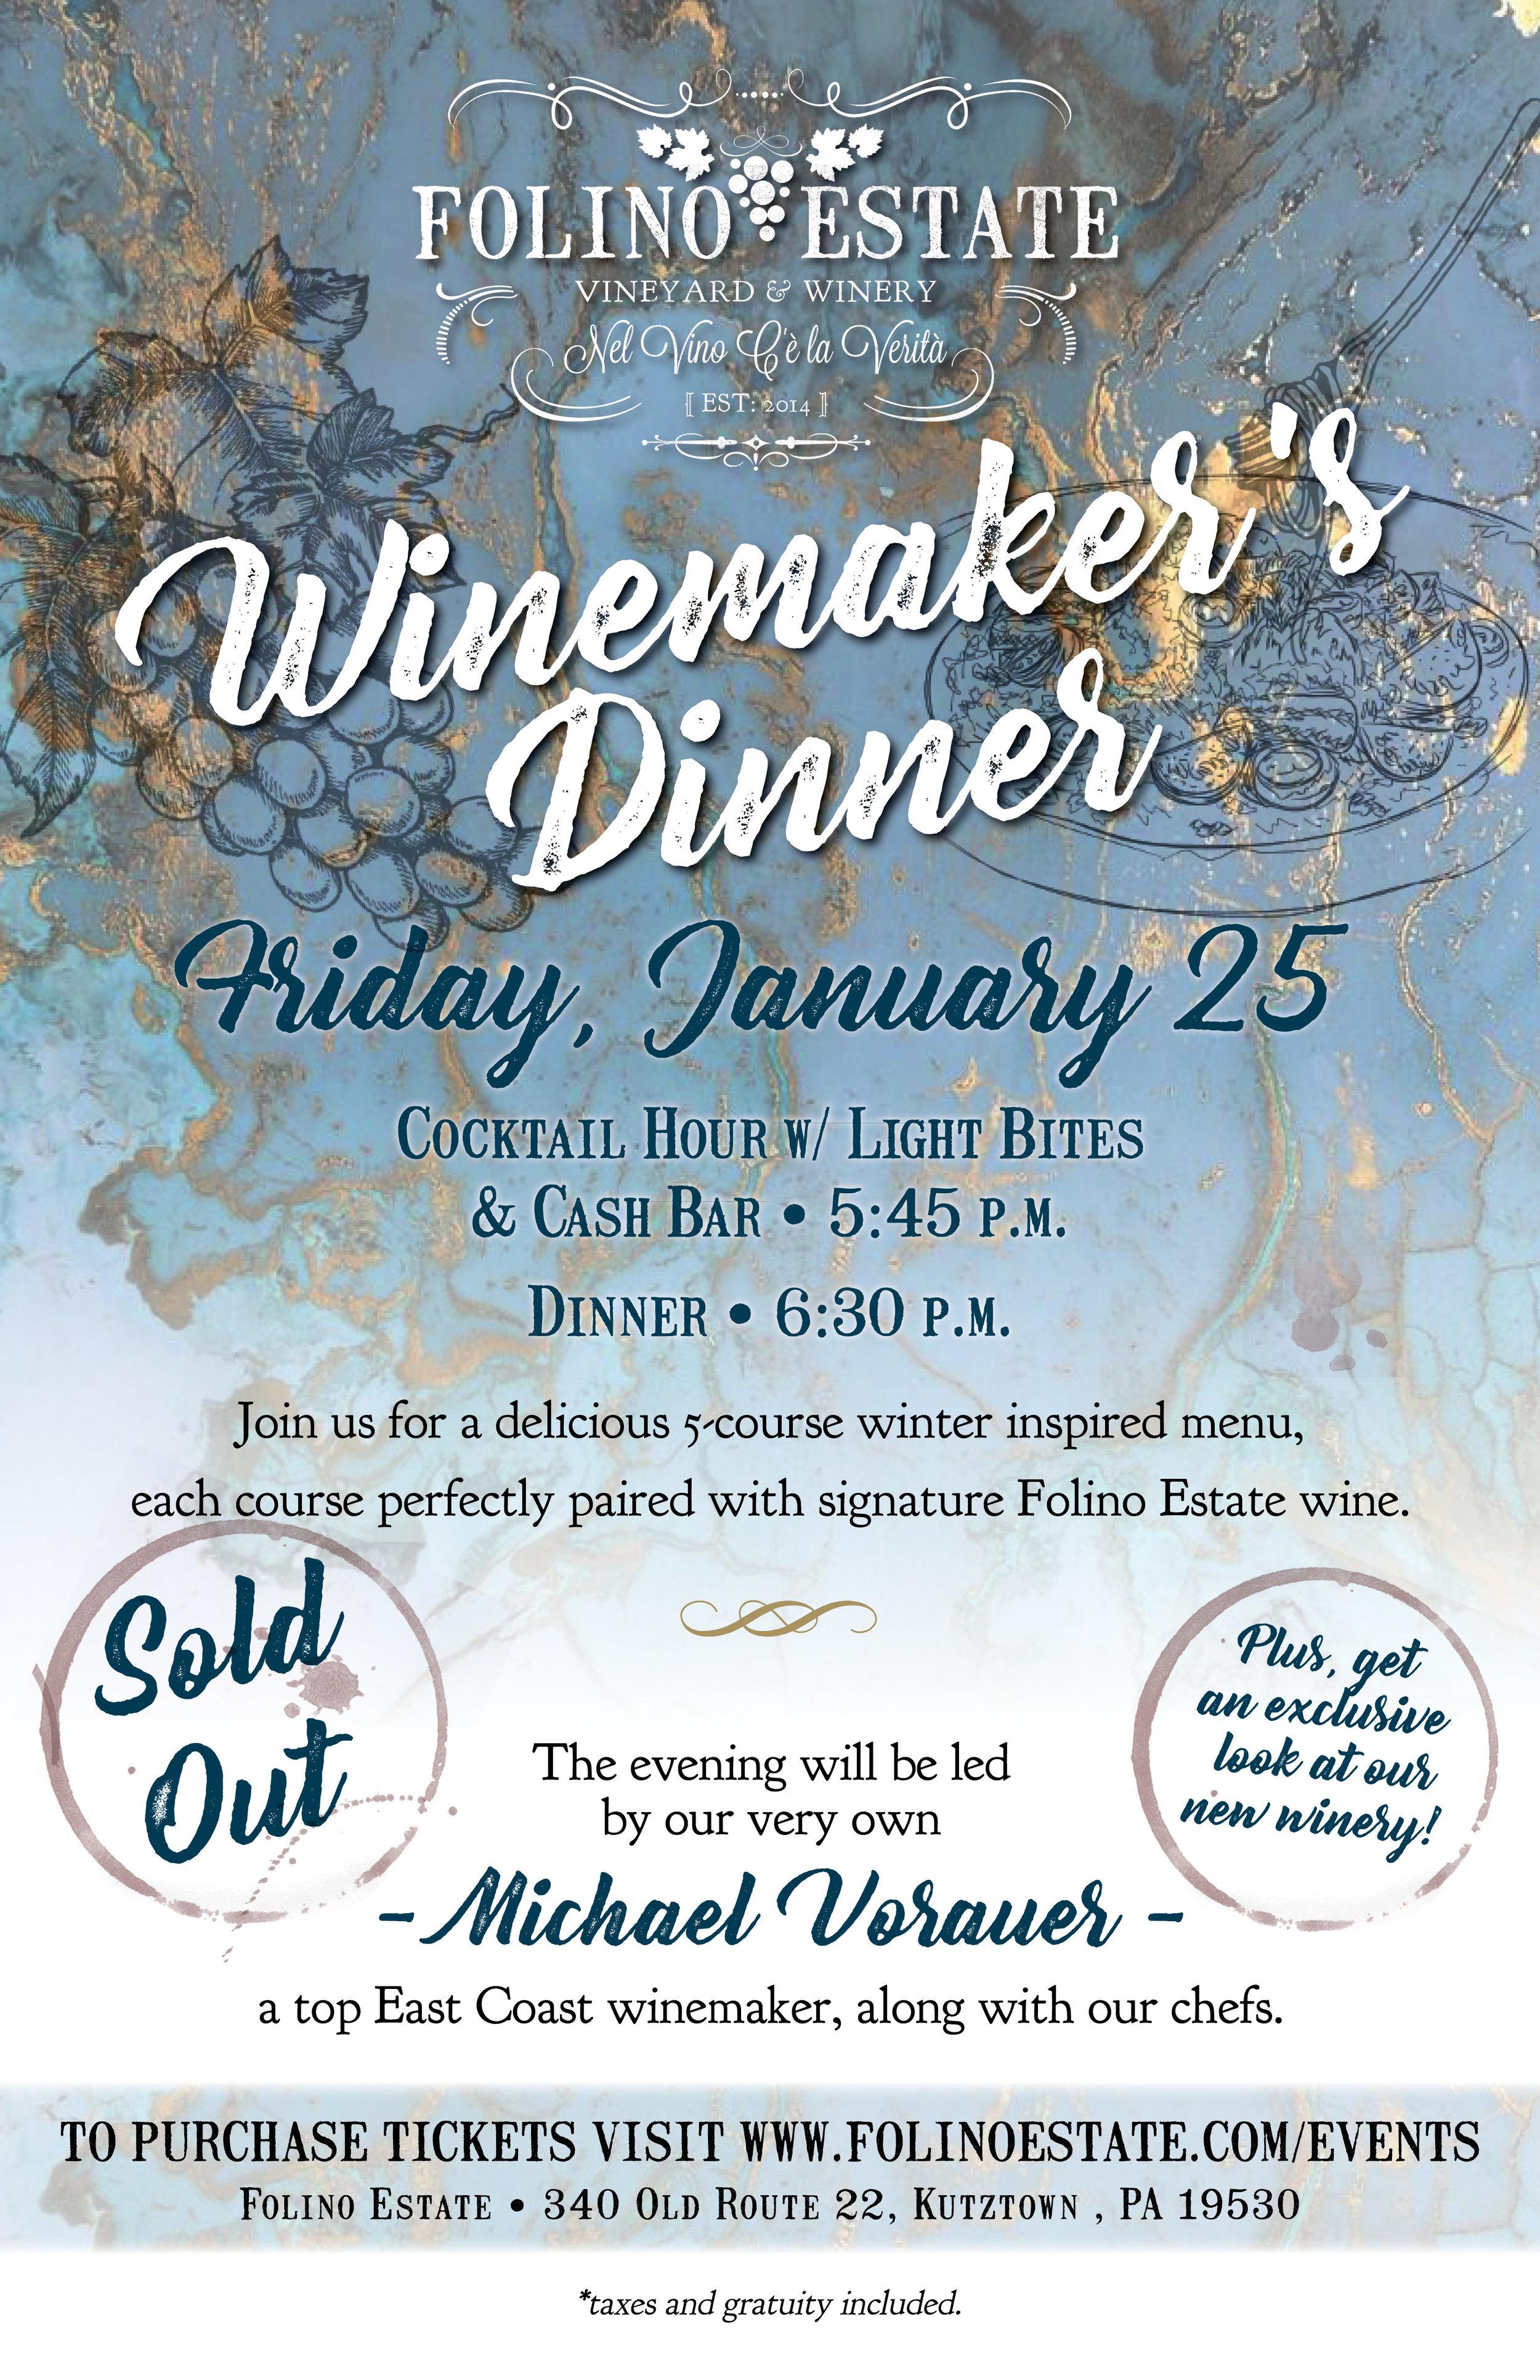 WinemakersDinner-Flyer-soldout.jpg